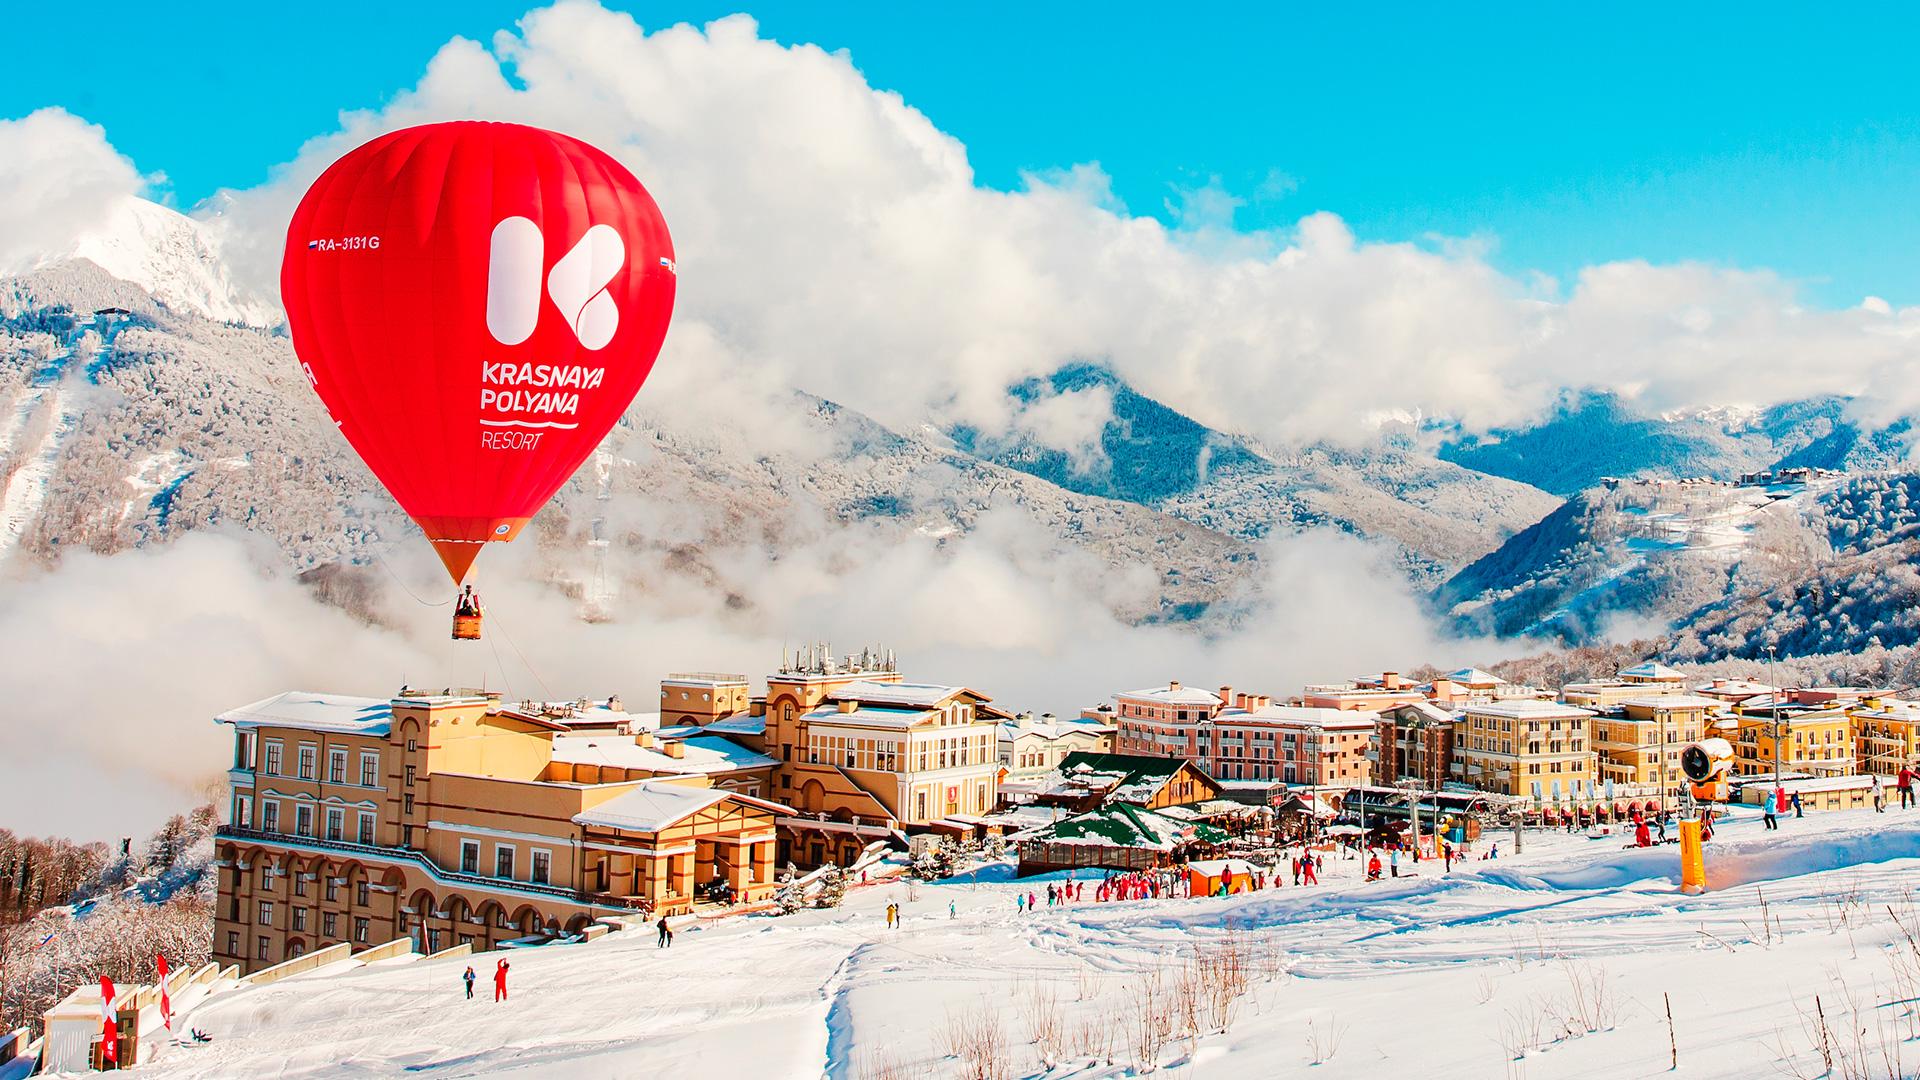 Асгард Брендинг, Красная Поляна, Красная Поляна курорт, фирменный стиль, айдентика, лого, красный логотип, горы, воздушный шар, air balloon